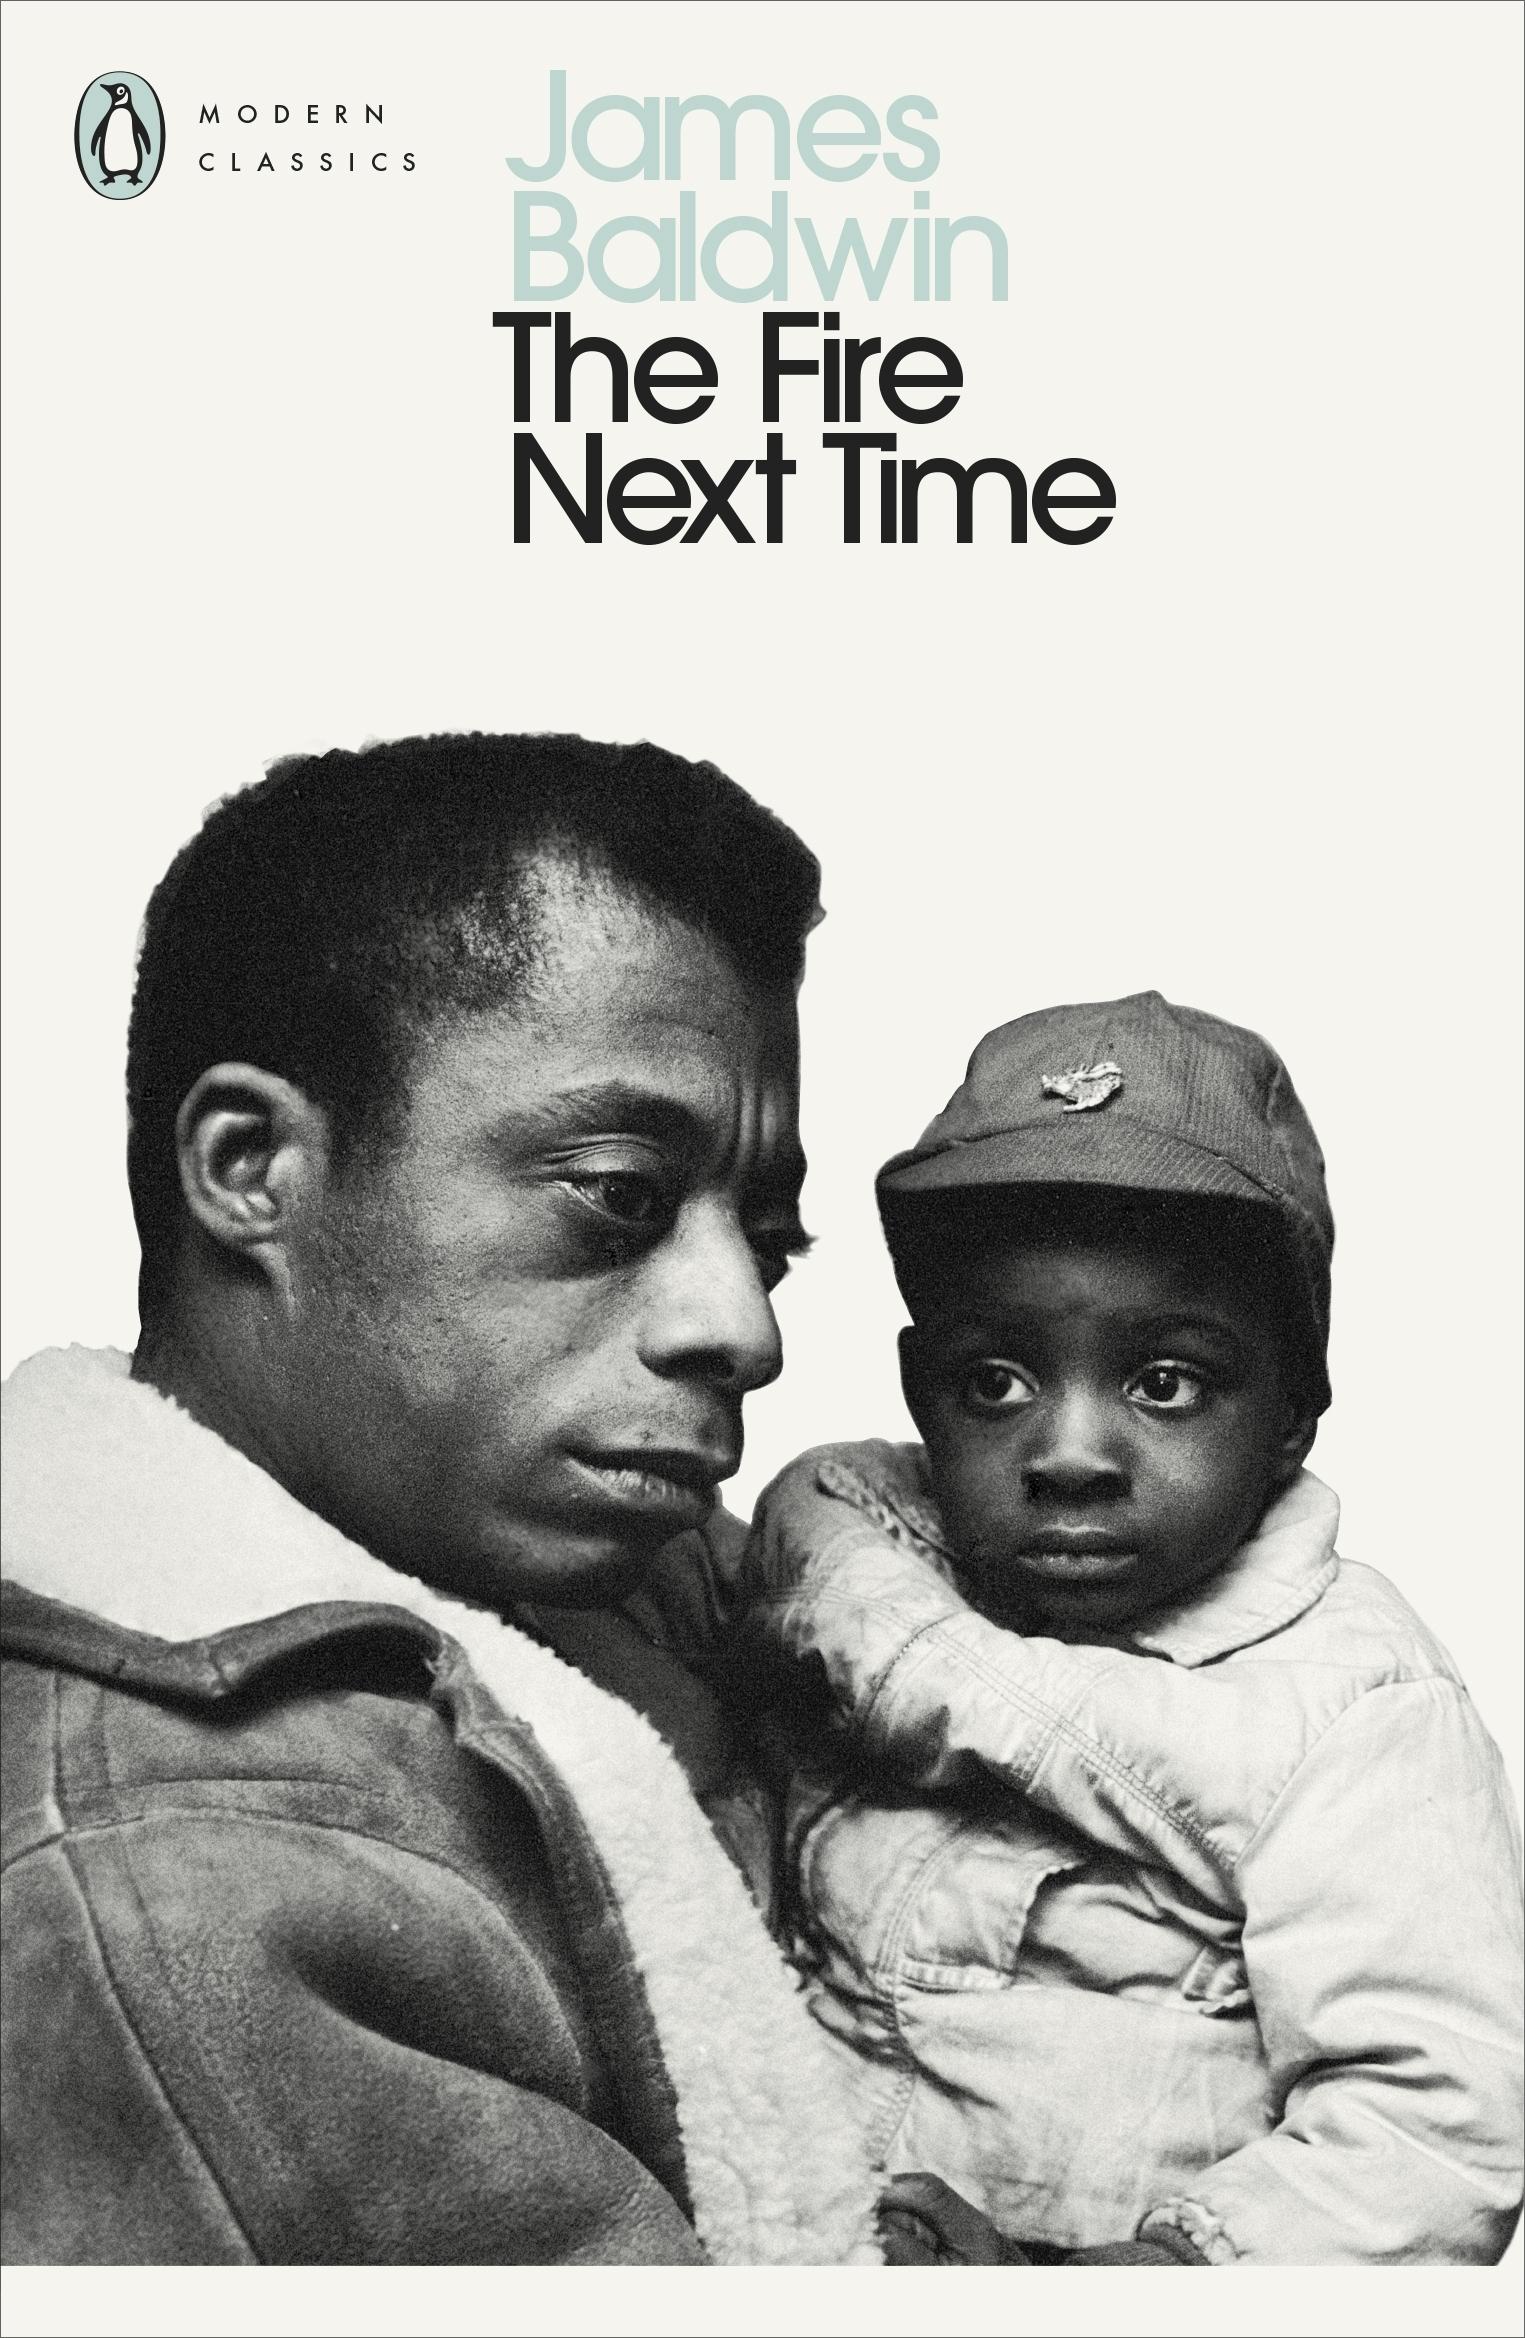 The Fire Next Time by James Baldwin - Penguin Books Australia